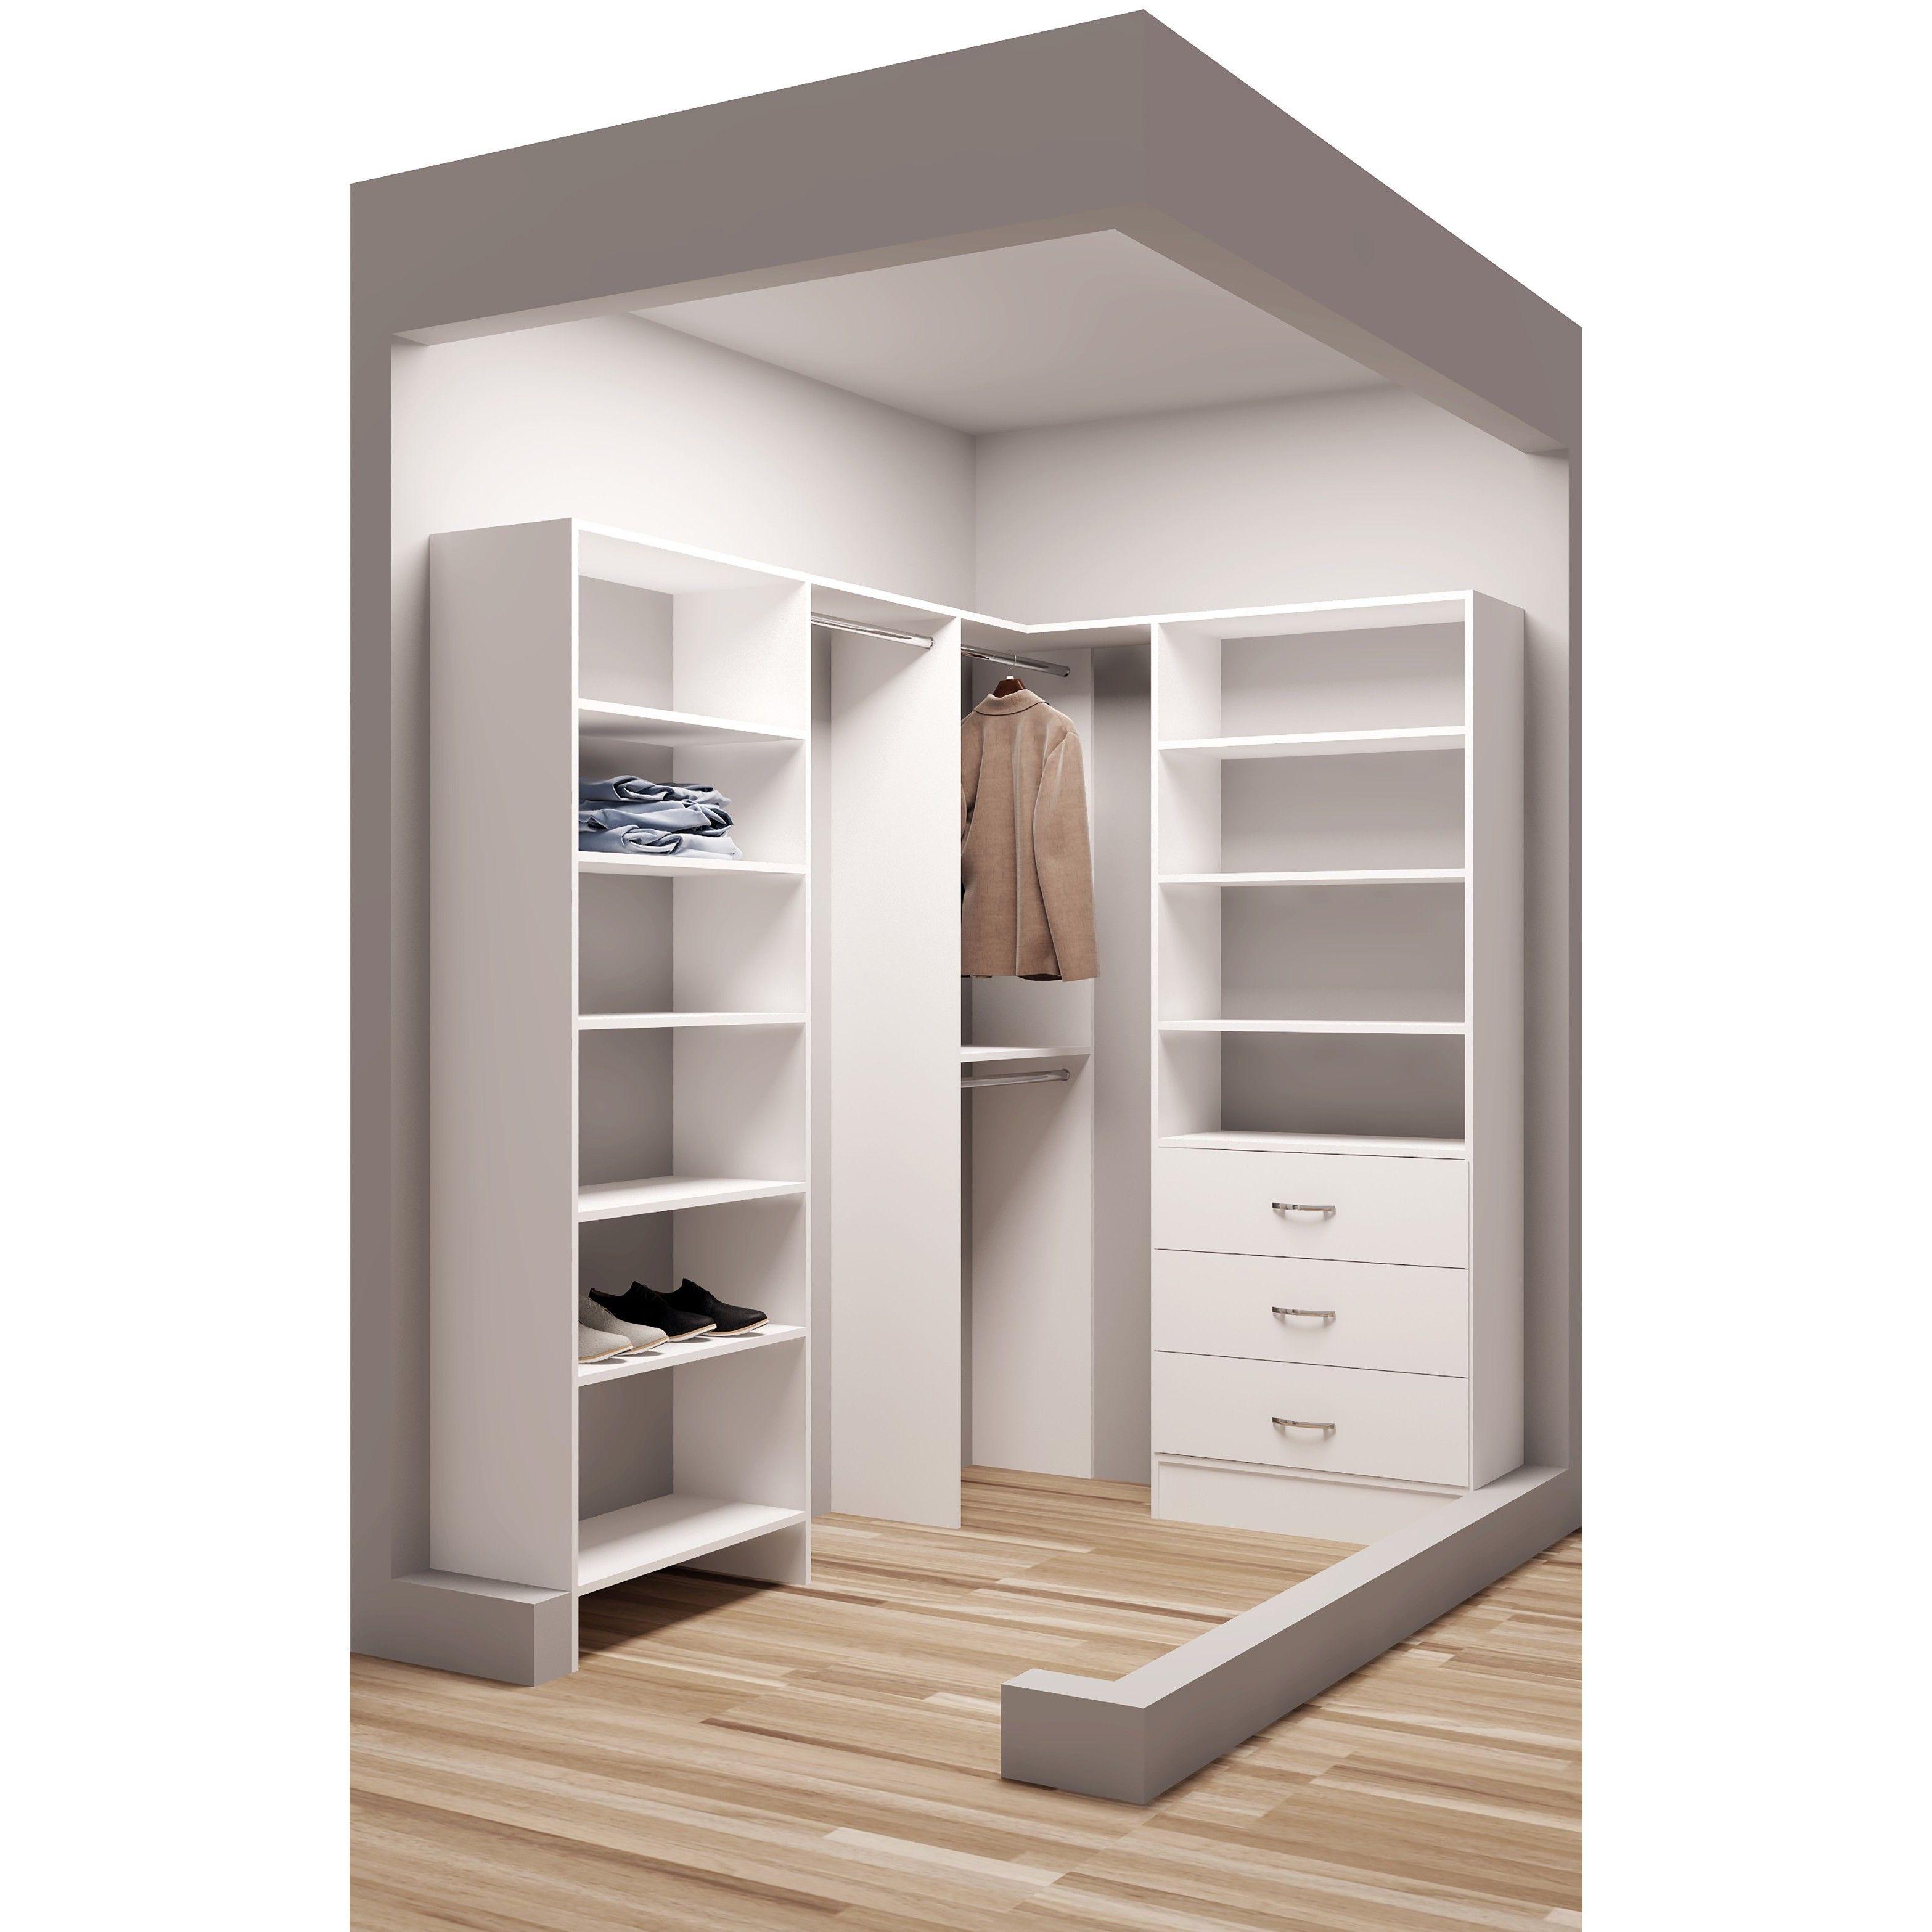 Tidysquares Classic White Wood 595 X 87 Corner Walk In Closet